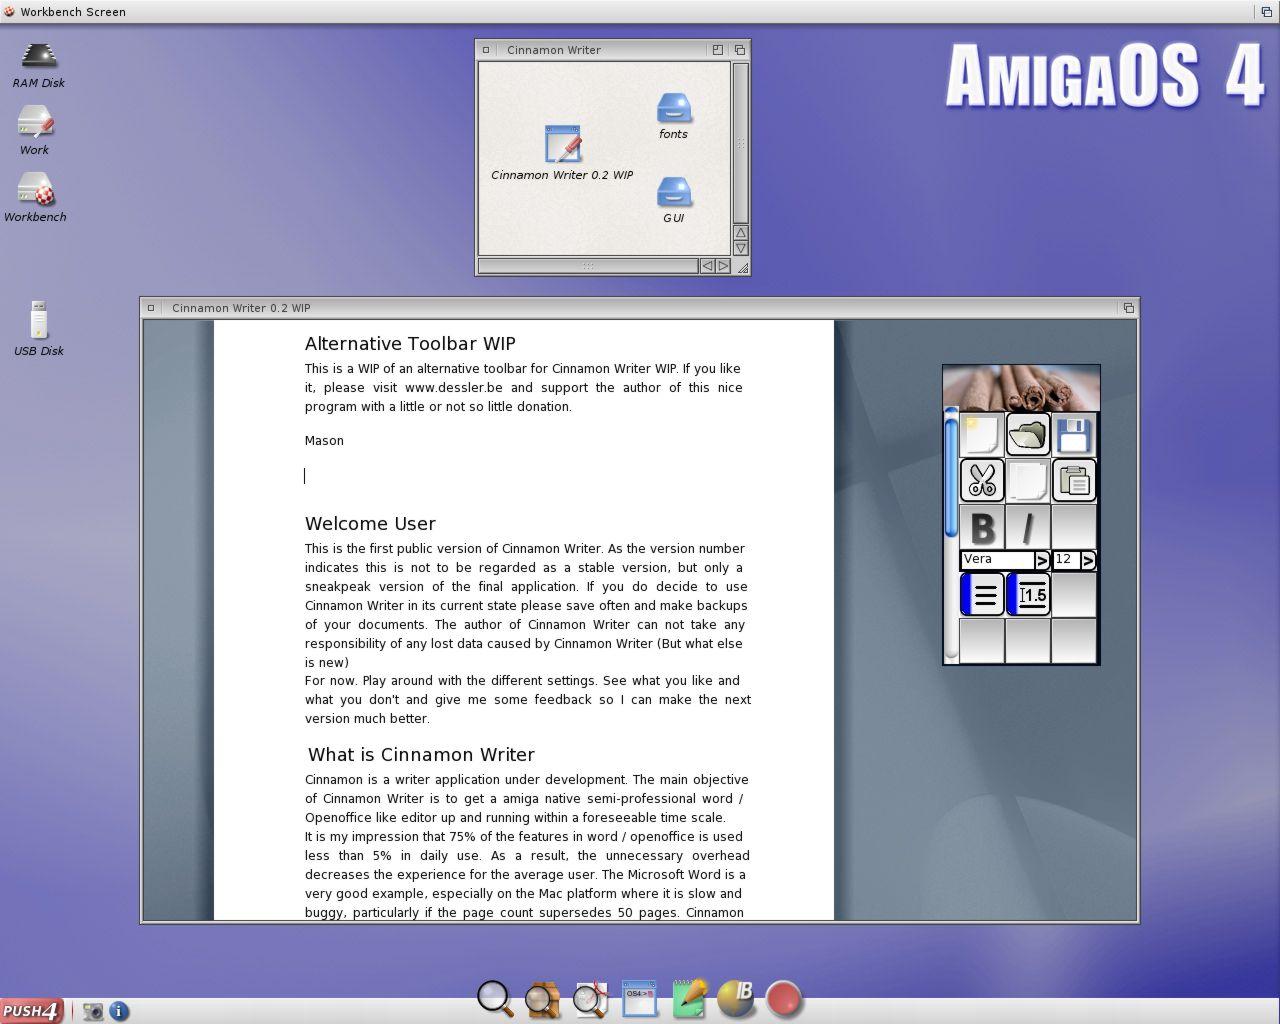 Cinnemon Writer WIP Masonicons Toolbar WIP